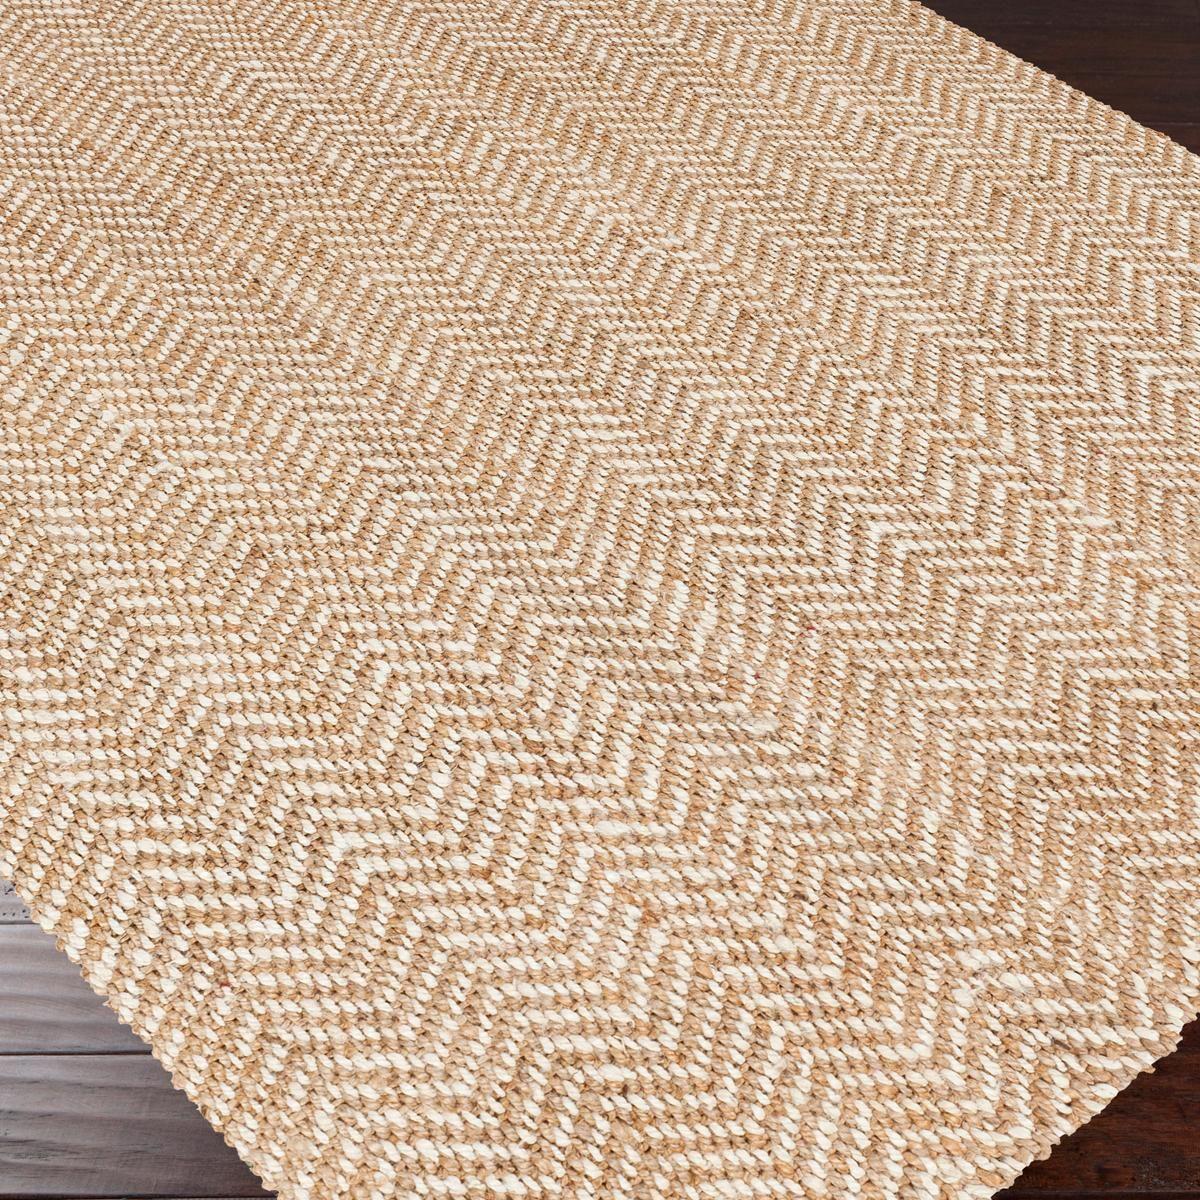 Herringbone Soft Jute Natural Rug 8x11 750 Natural Jute Rug Rugs Natural Fiber Rugs Natural fiber rugs that are soft